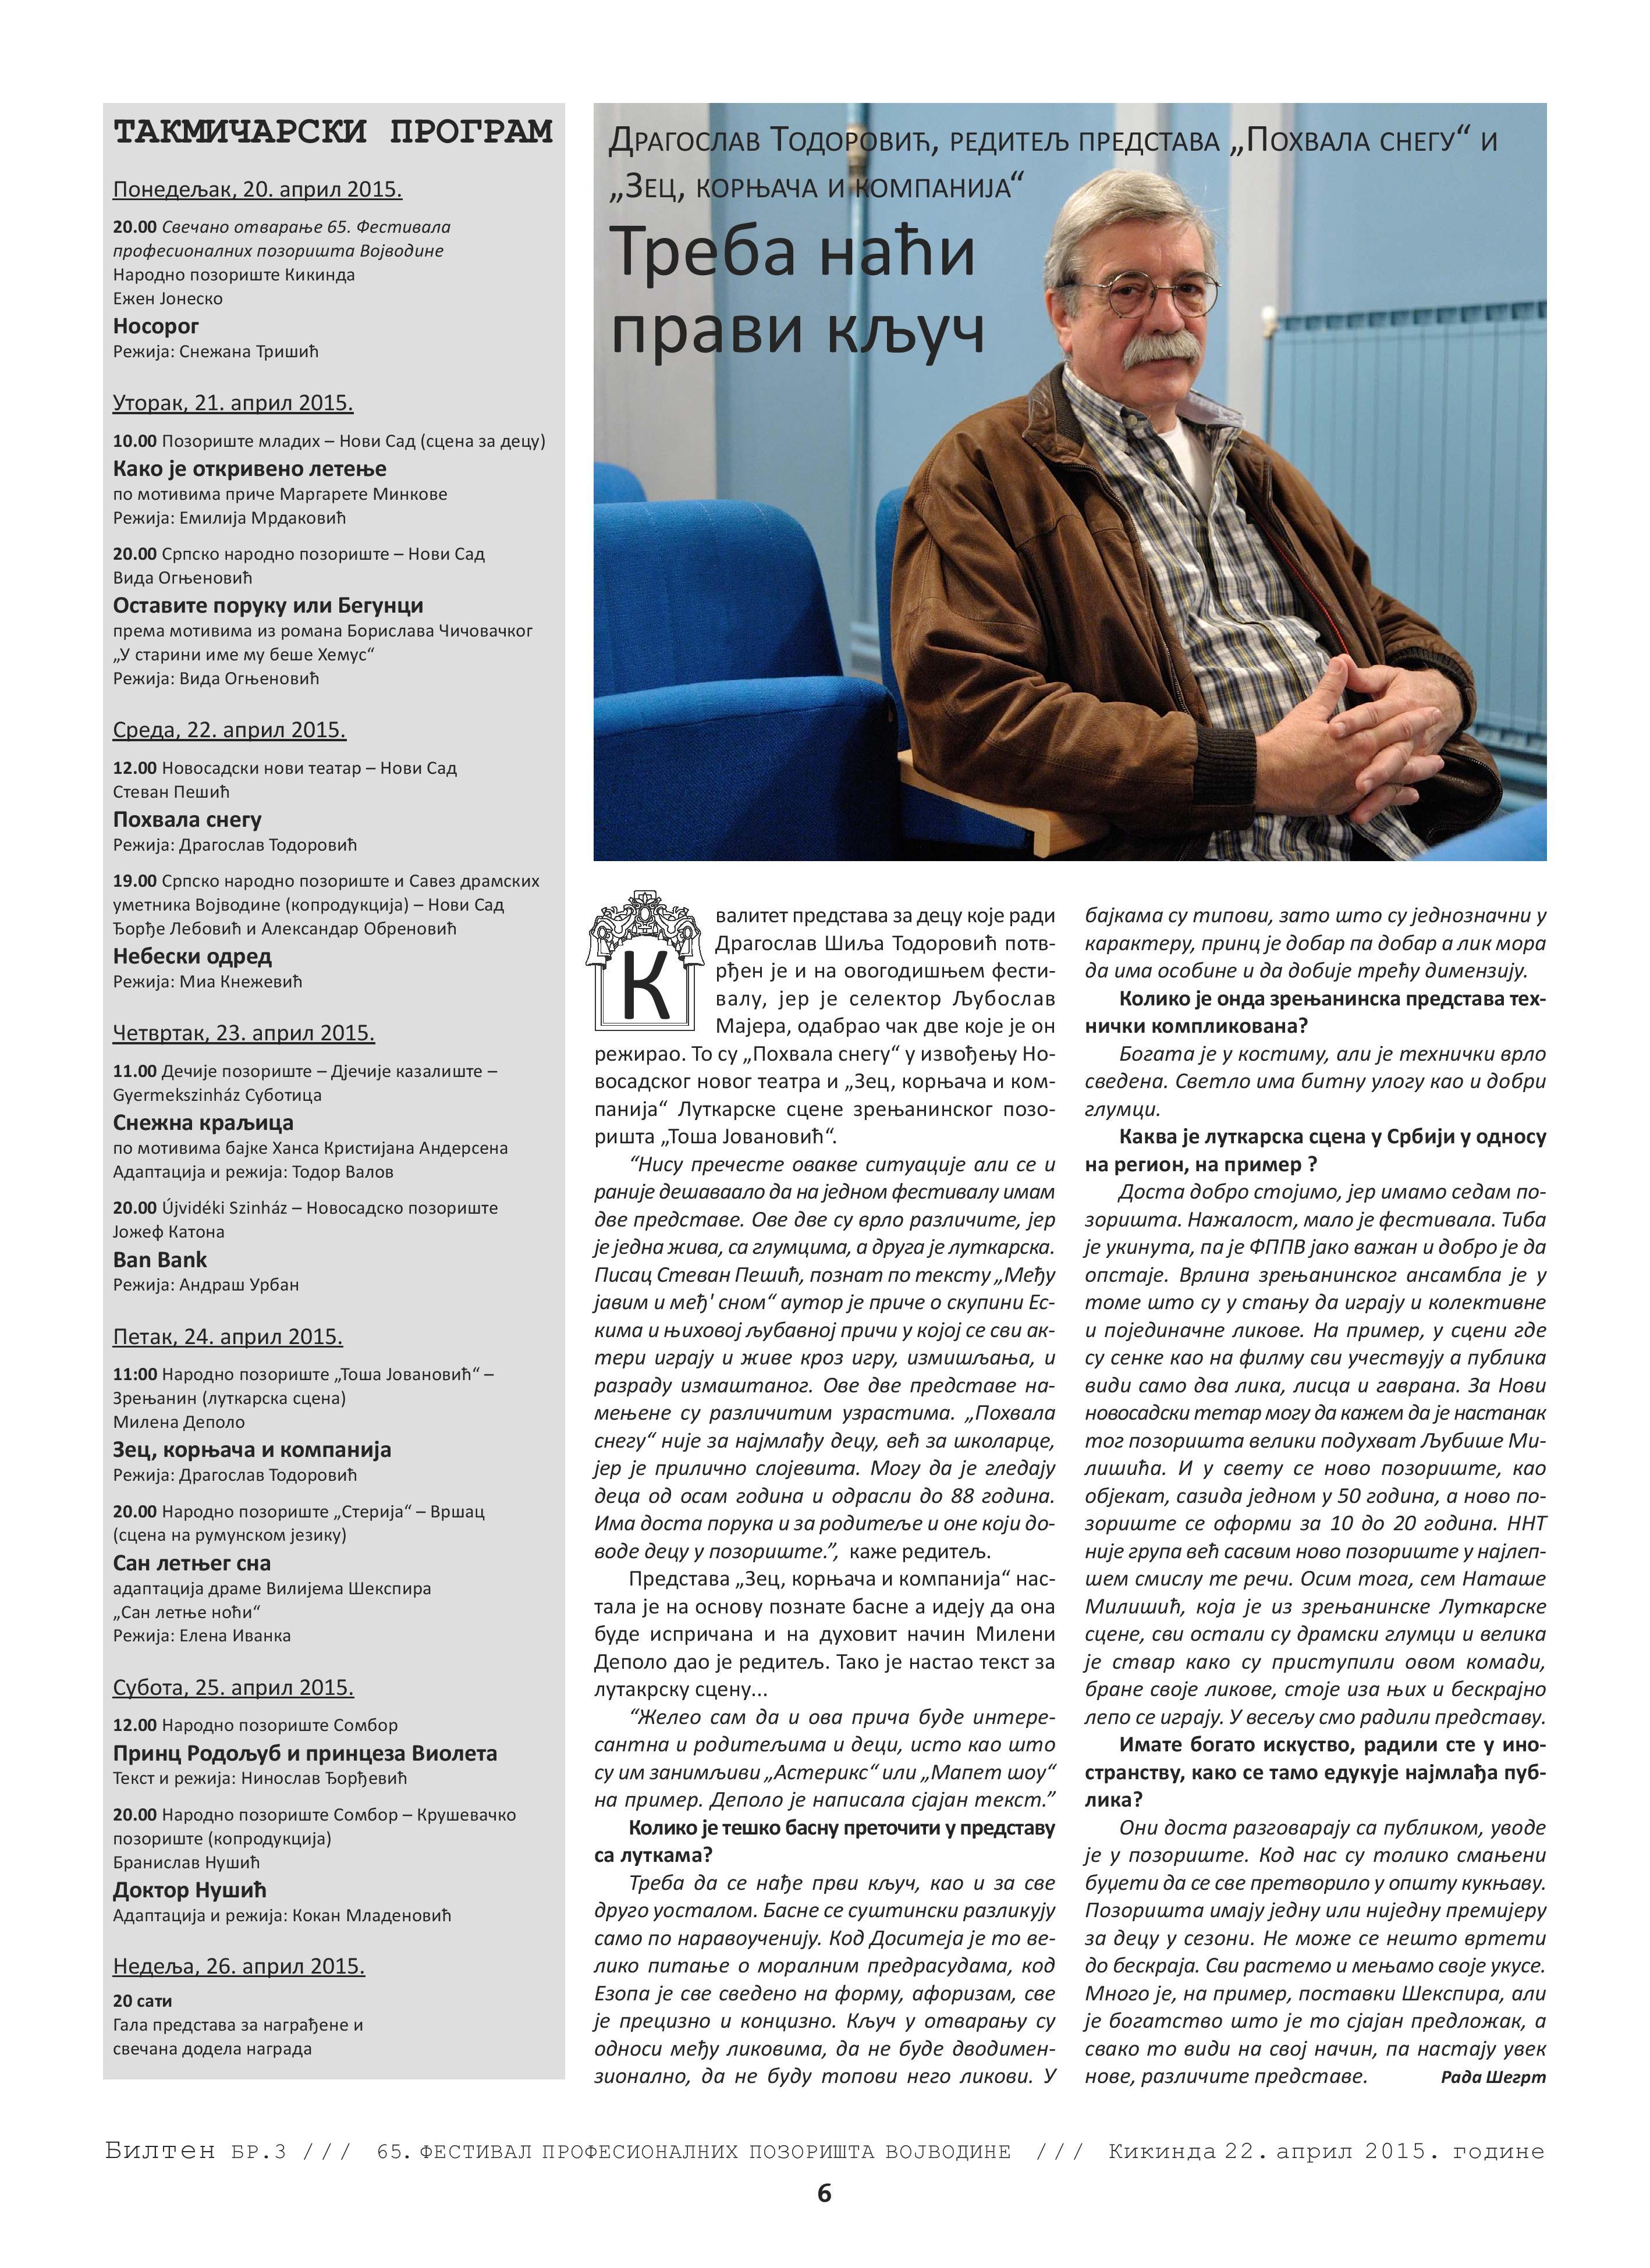 BILTEN_03_22 april-page-006